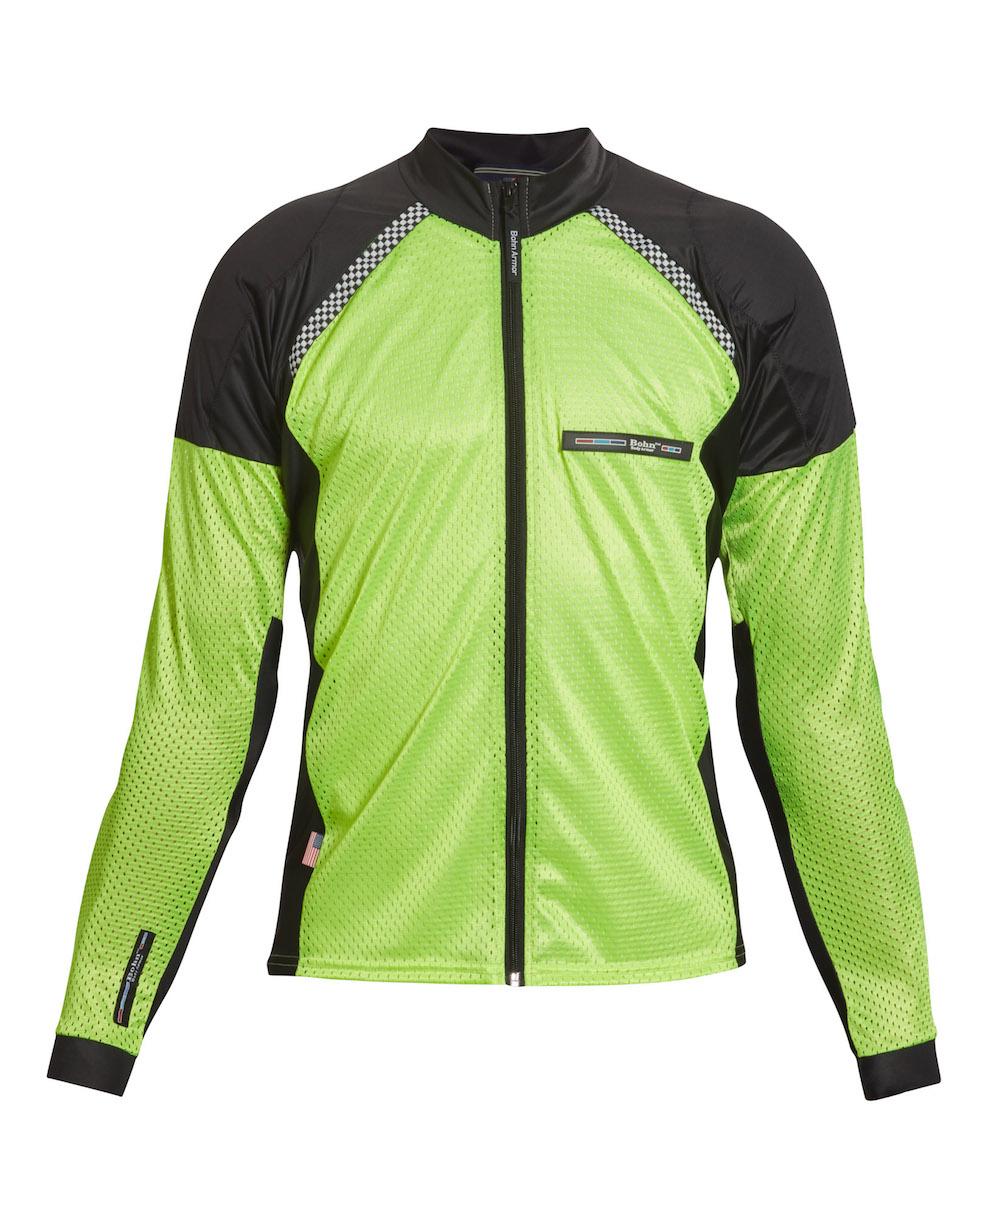 6cf47ad89622 All-Season Airtex Armored Riding Shirt - Hi-Vis Yellow